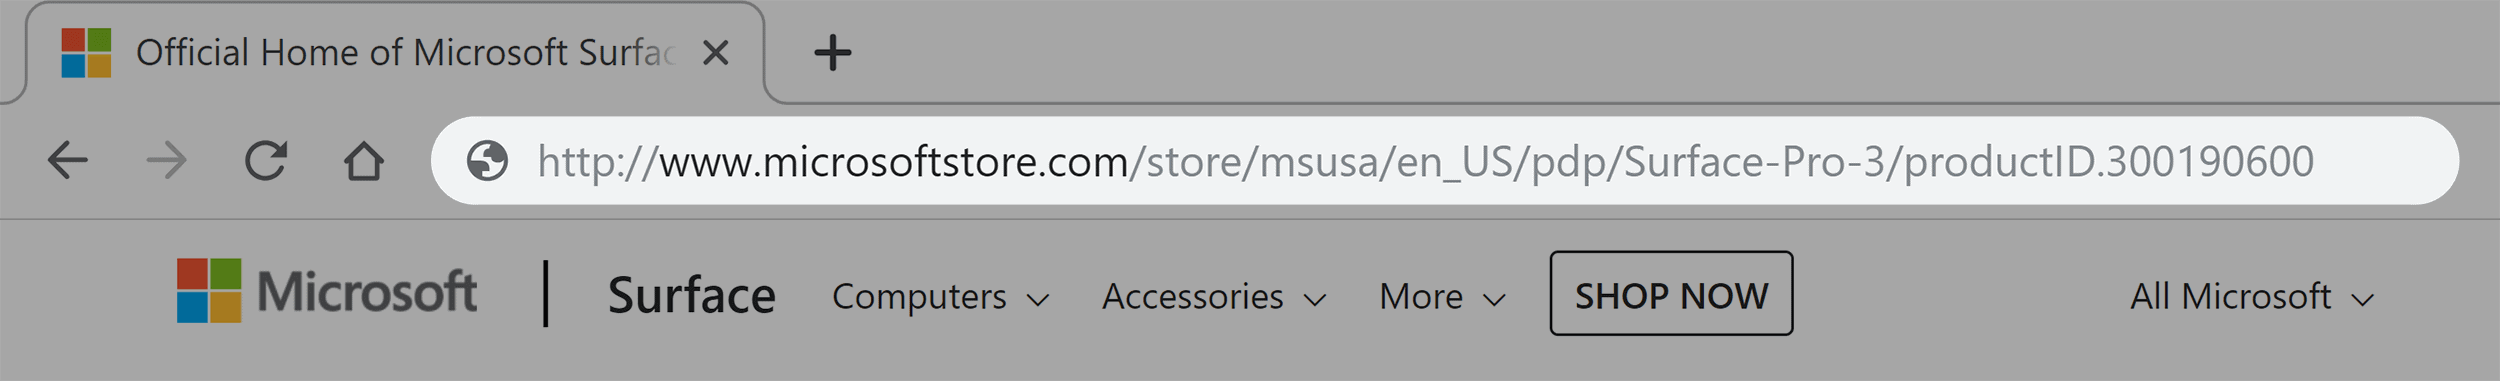 Microsoft link